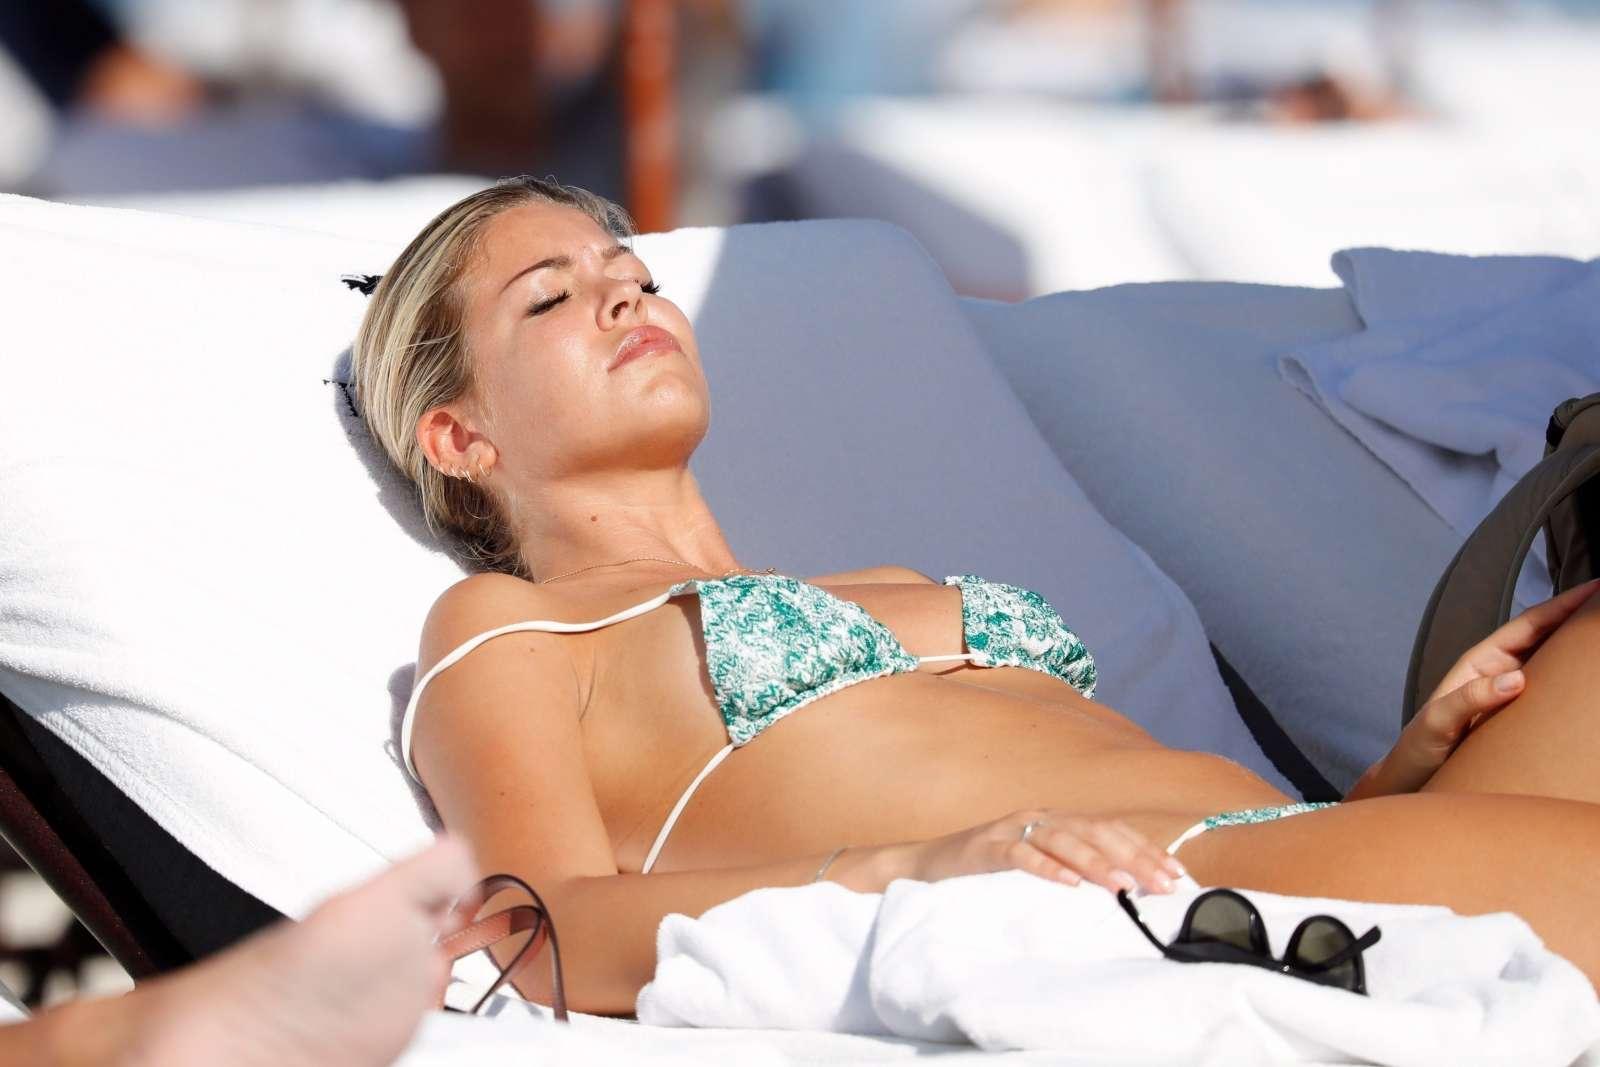 Constance Caracciolo 2017 : Constance Caracciolo in Bikini Sunbathing -24